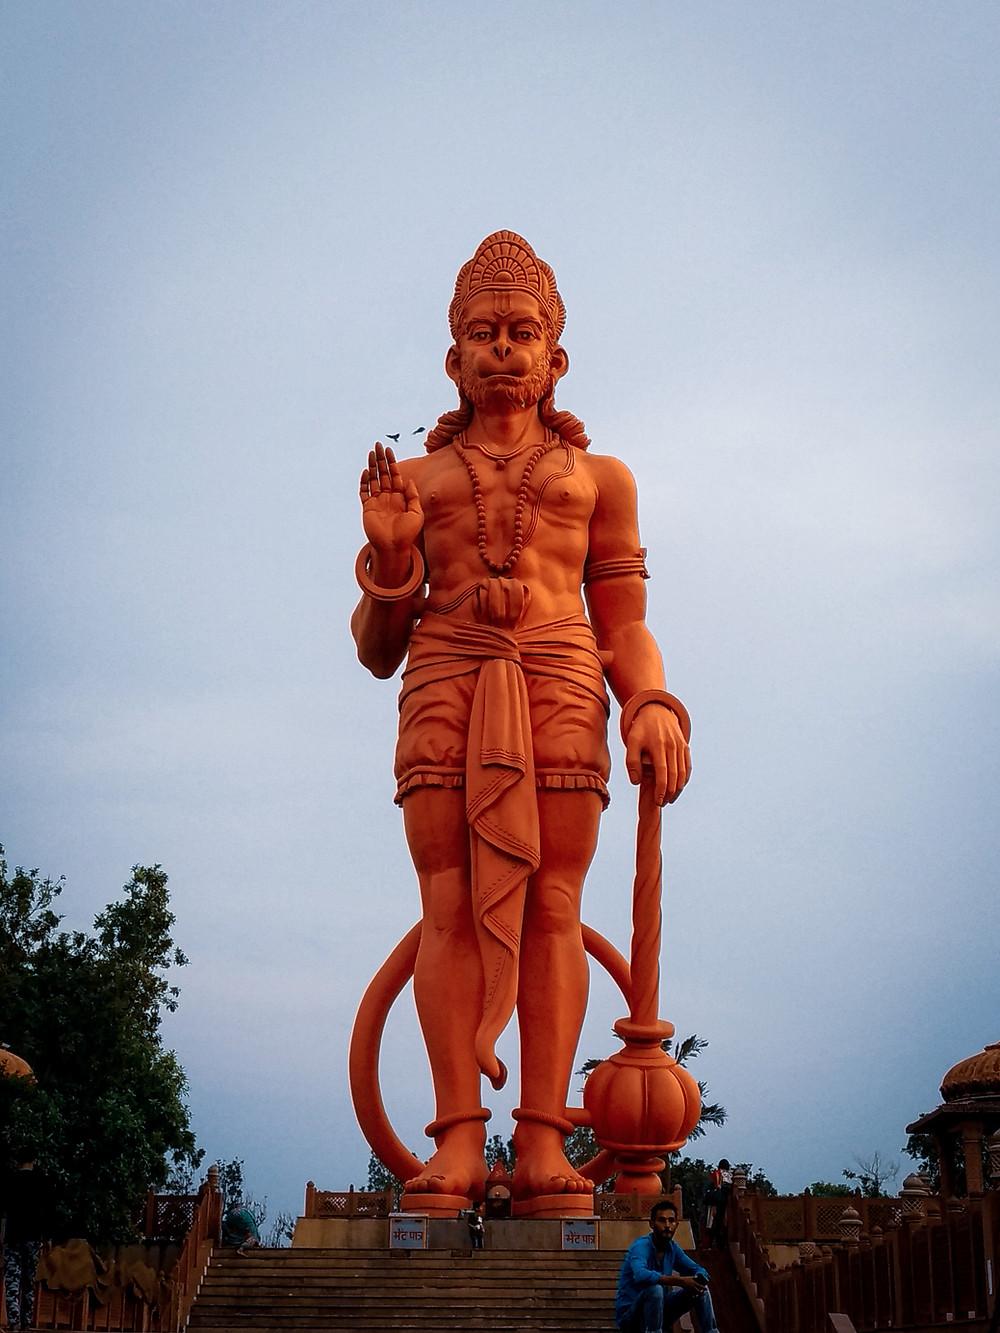 Mantras a Hanuman - Astrología Védica - Ganga Sutaya - Barcelona